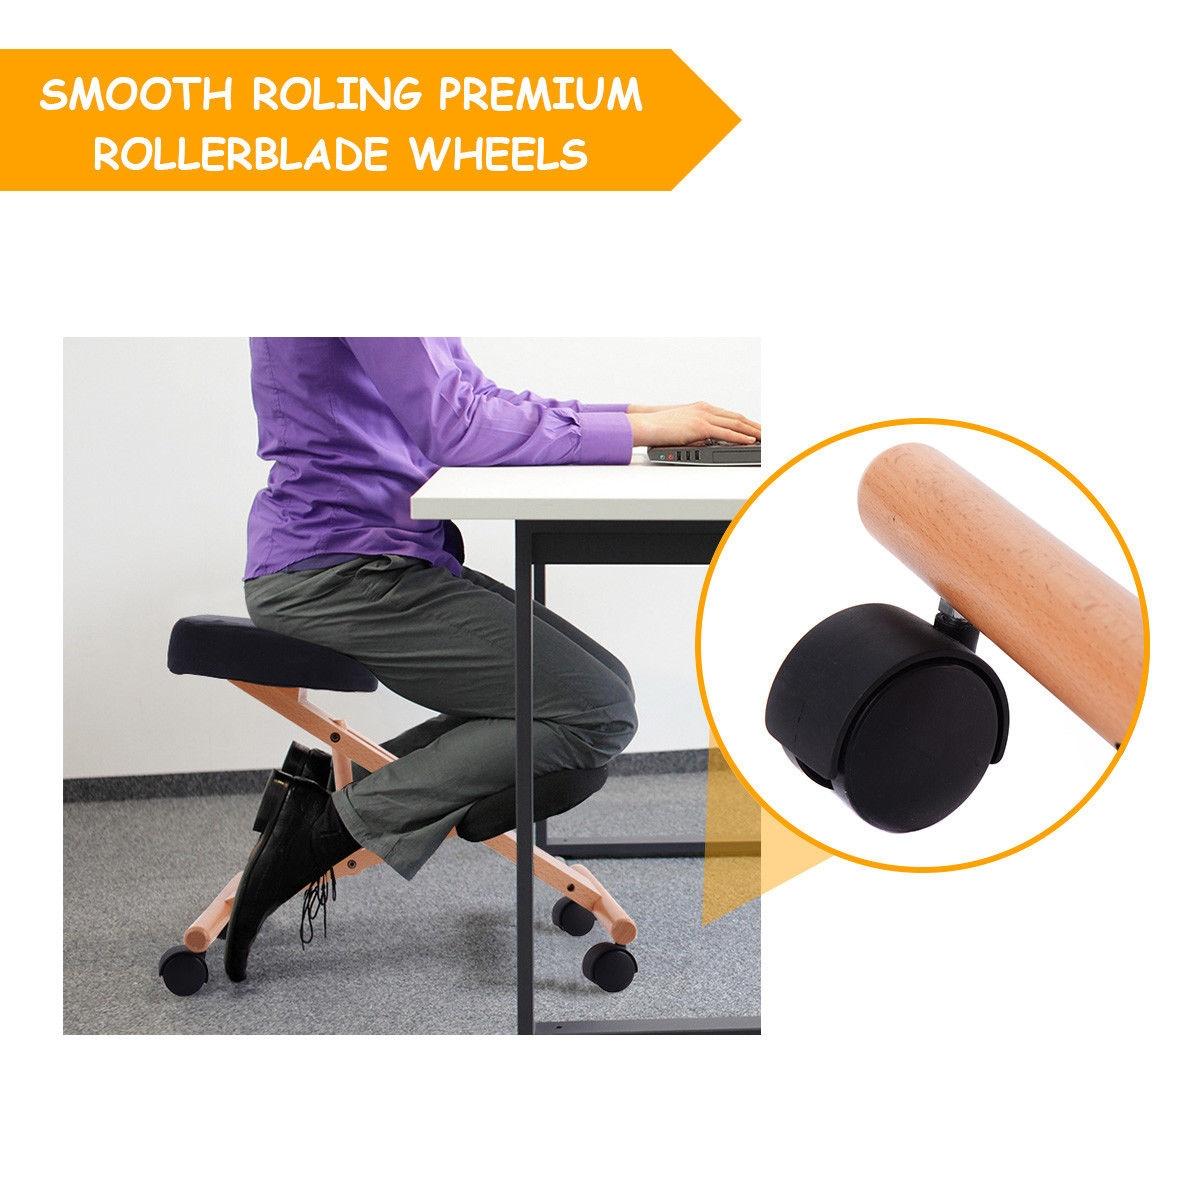 Ergonomic Kneeling Chair Wooden Adjustable Mobile Padded Seat and Knee-Black